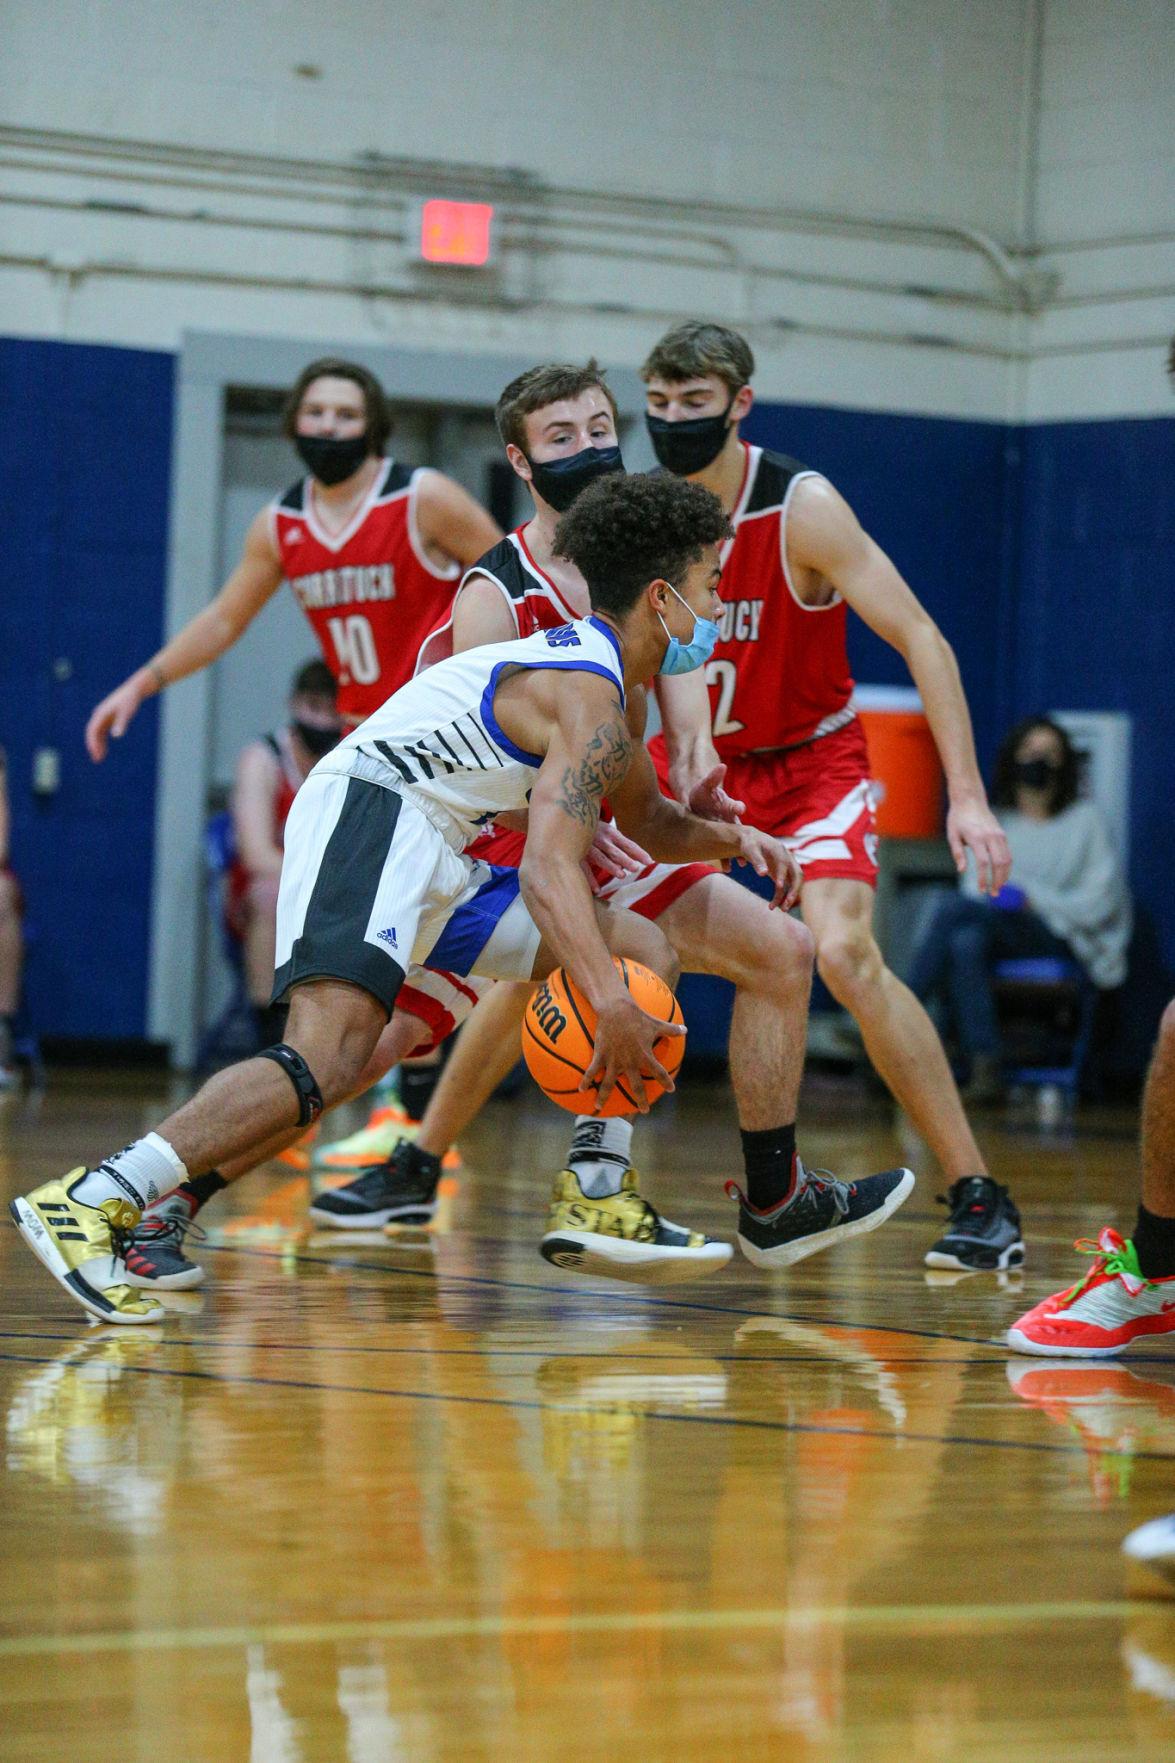 010821_eda_barnett_camden_currituck_basketball_2